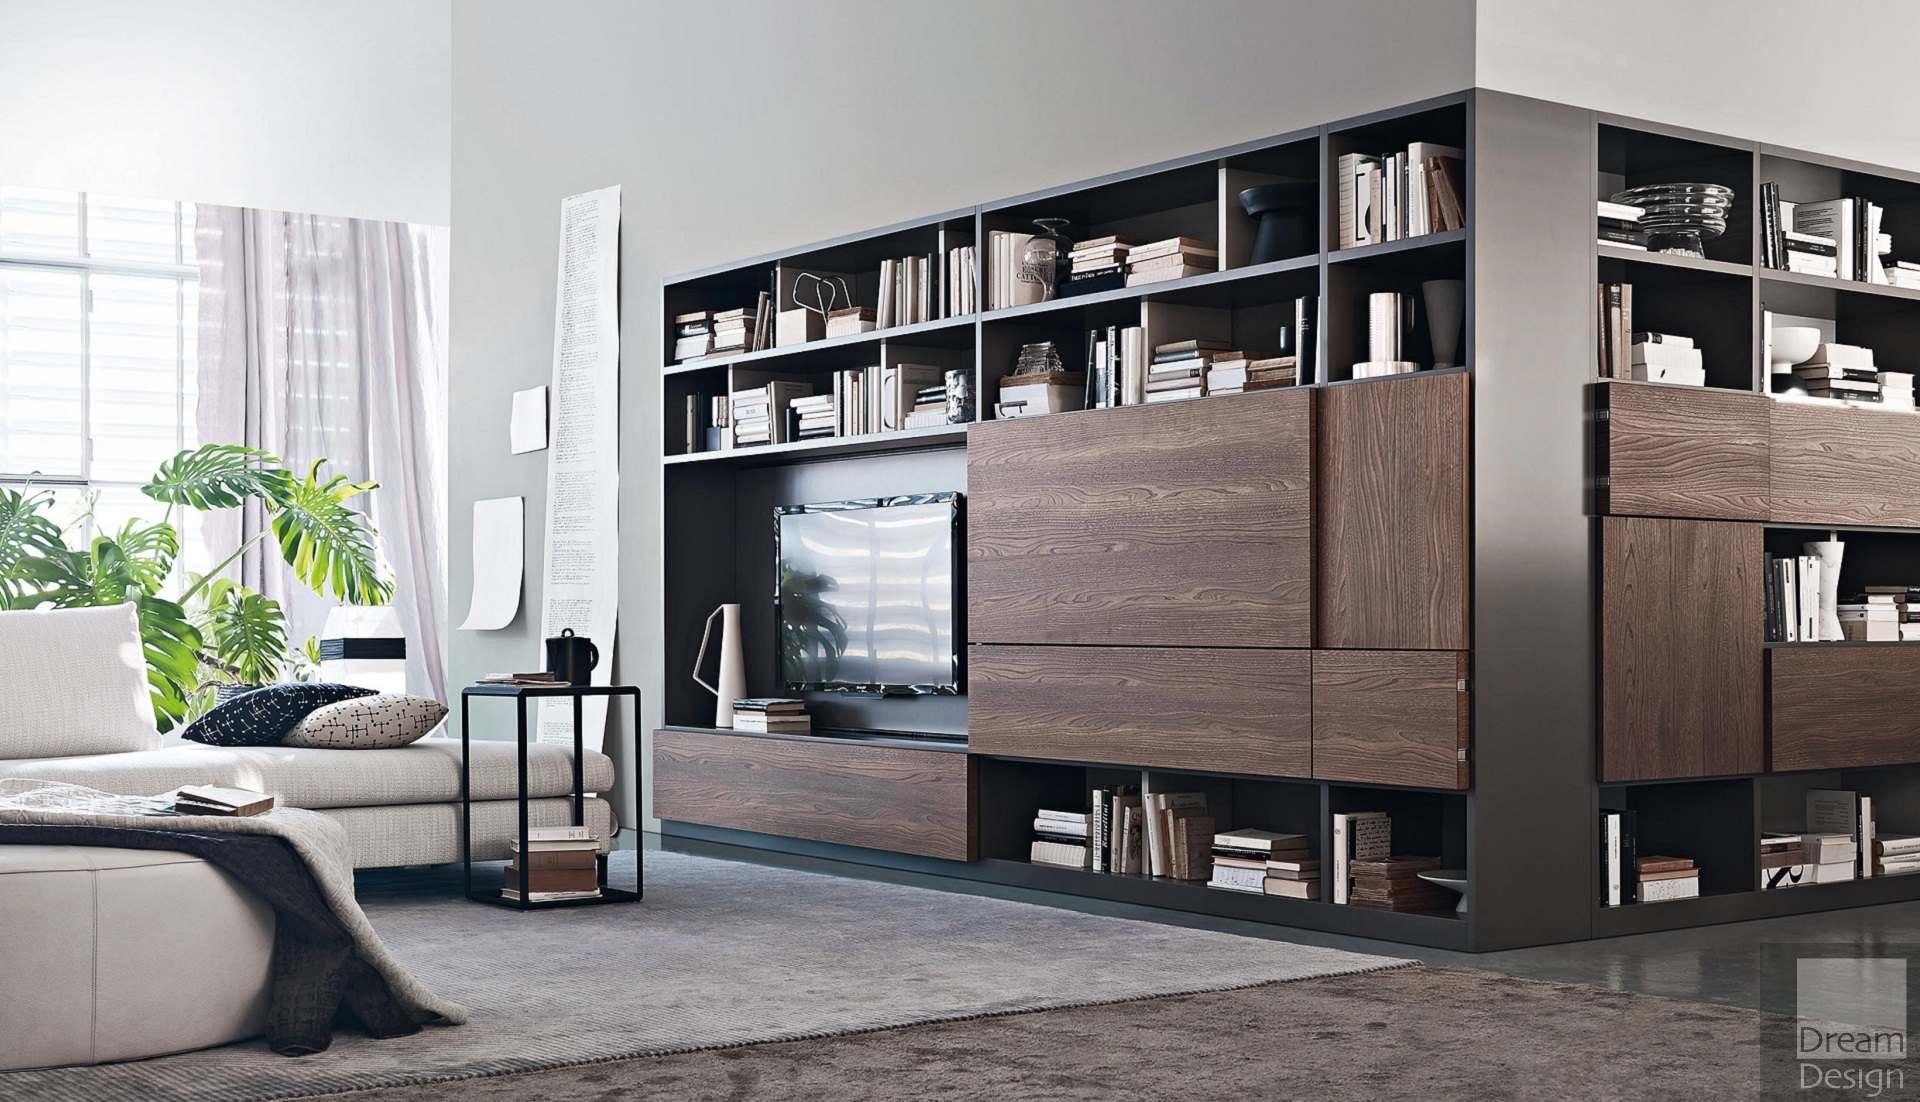 molteni c 505 system dream design interiors ltd. Black Bedroom Furniture Sets. Home Design Ideas